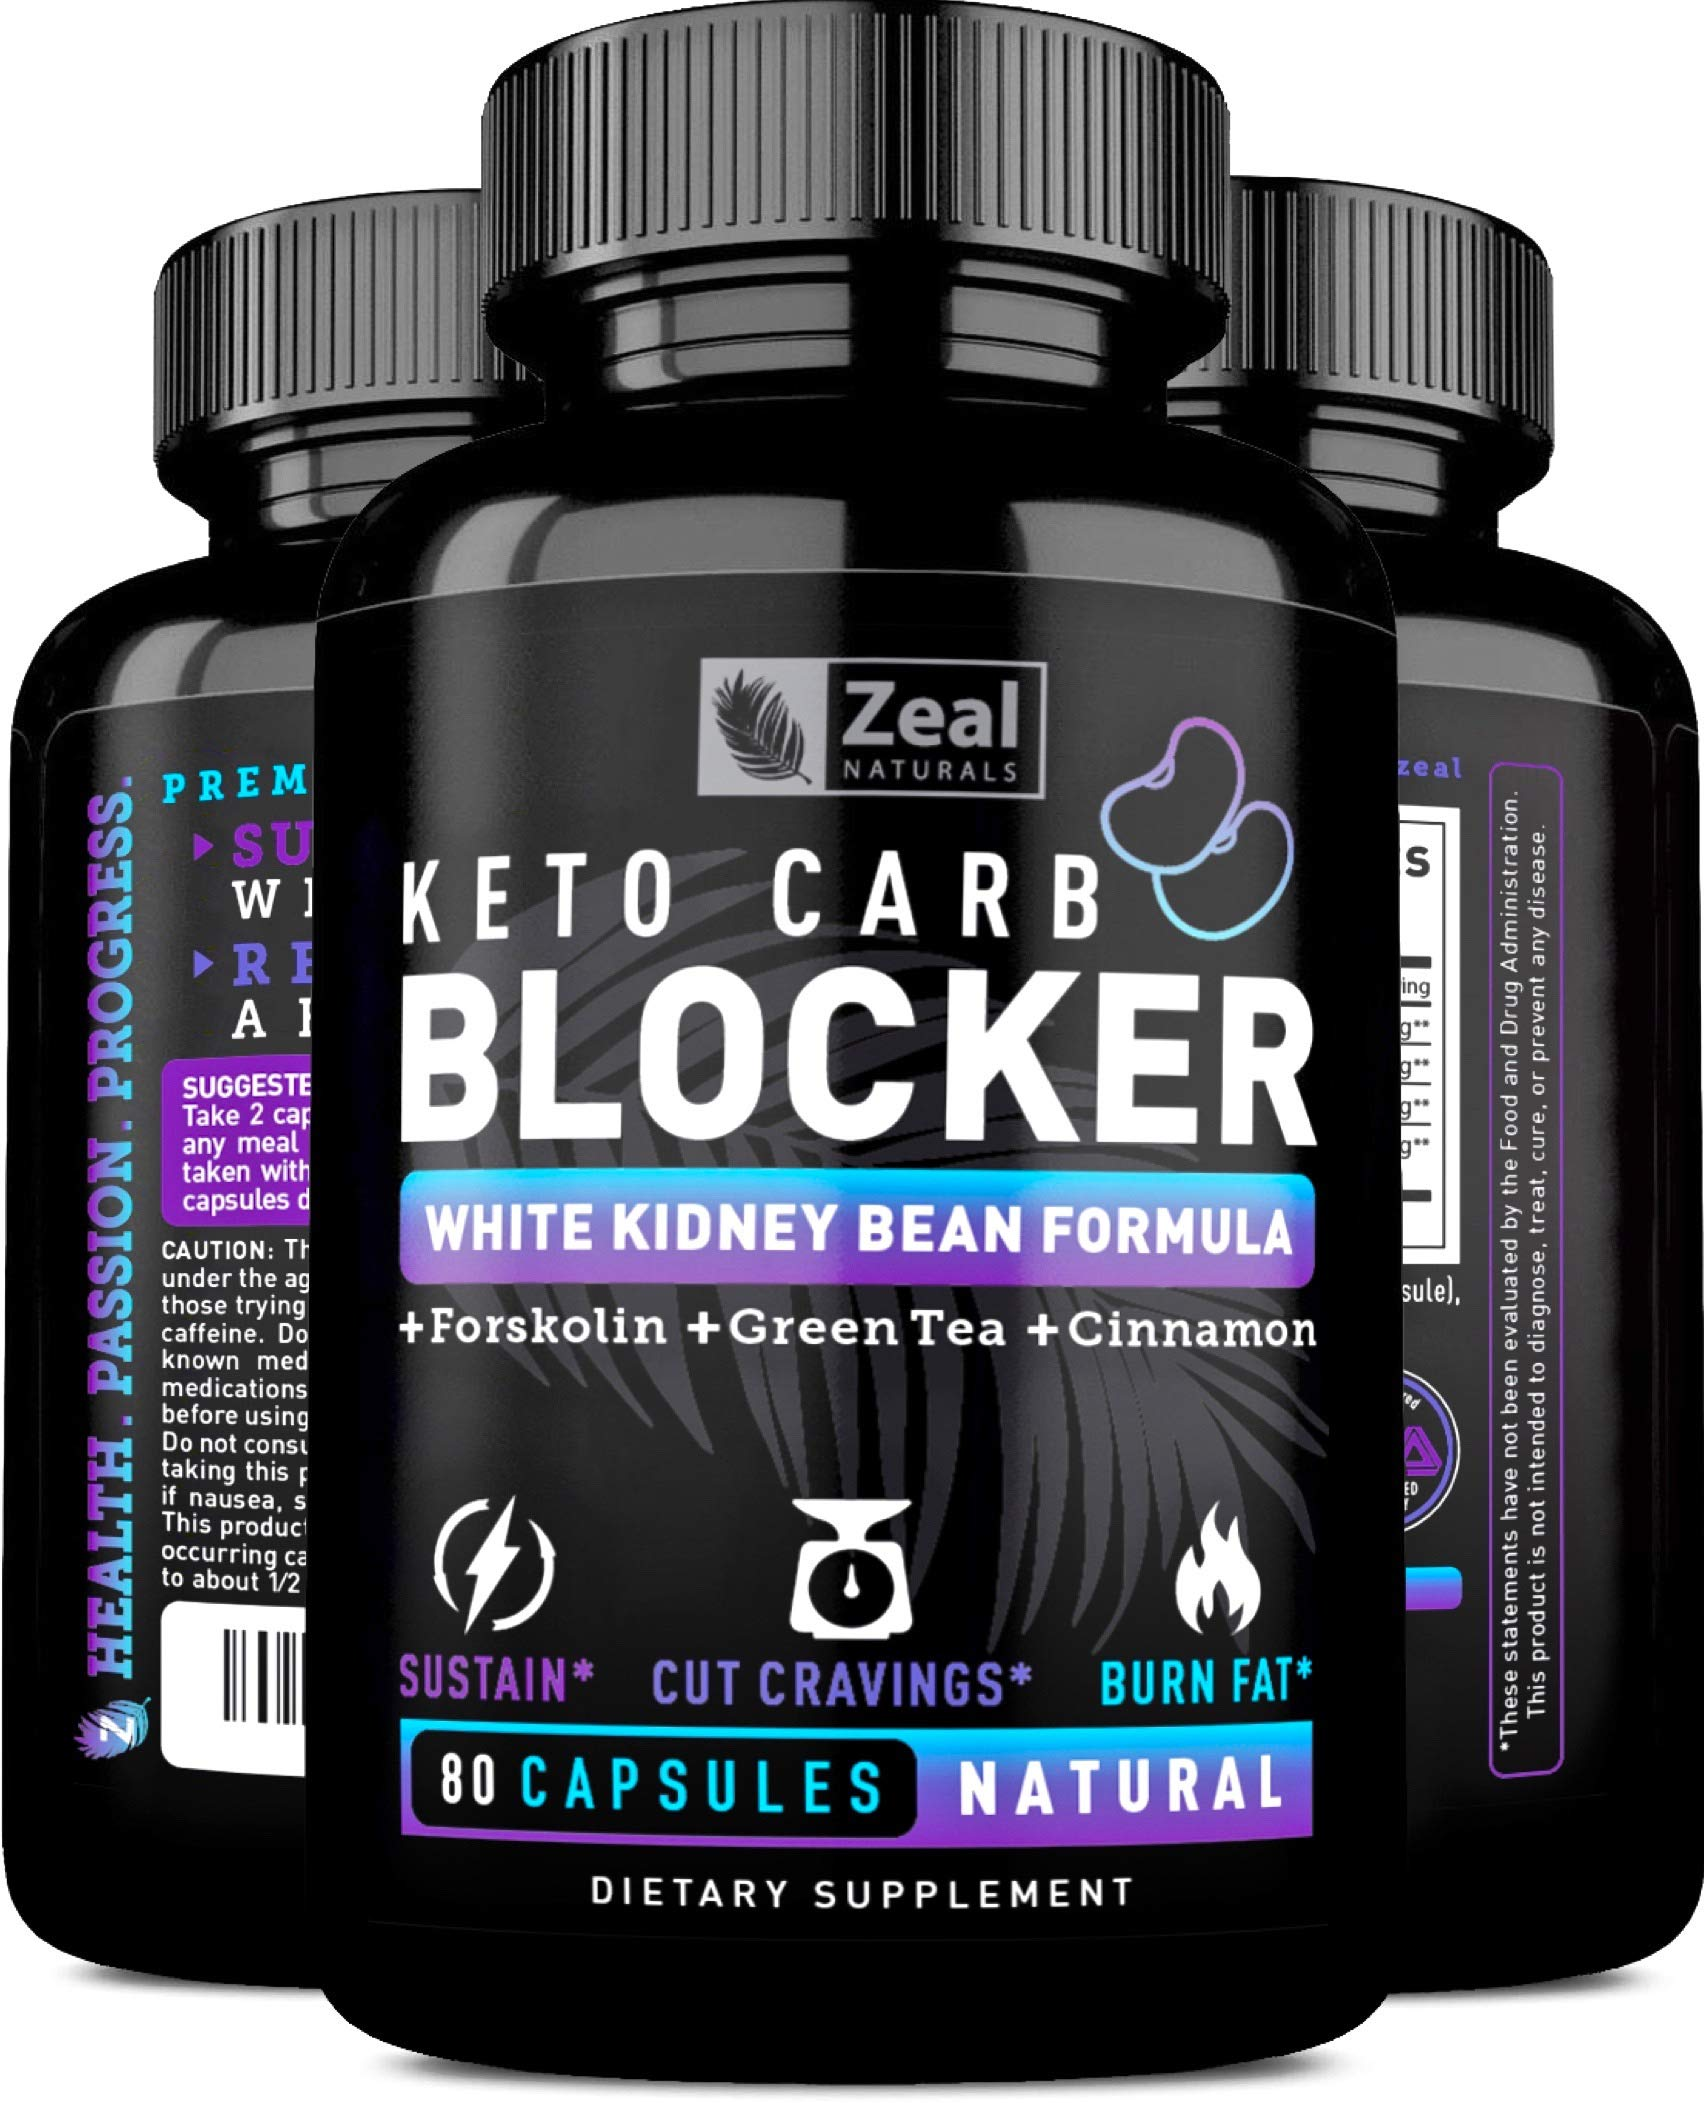 KETO White Kidney Bean Carb Blocker + Forskolin (40 Servings) White Kidney Bean Extract & Forskolin for Weight Loss w Green Tea - Keto Diet Carb Blockers Weight Loss Pills - Keto Cheat Pills Keto Burn